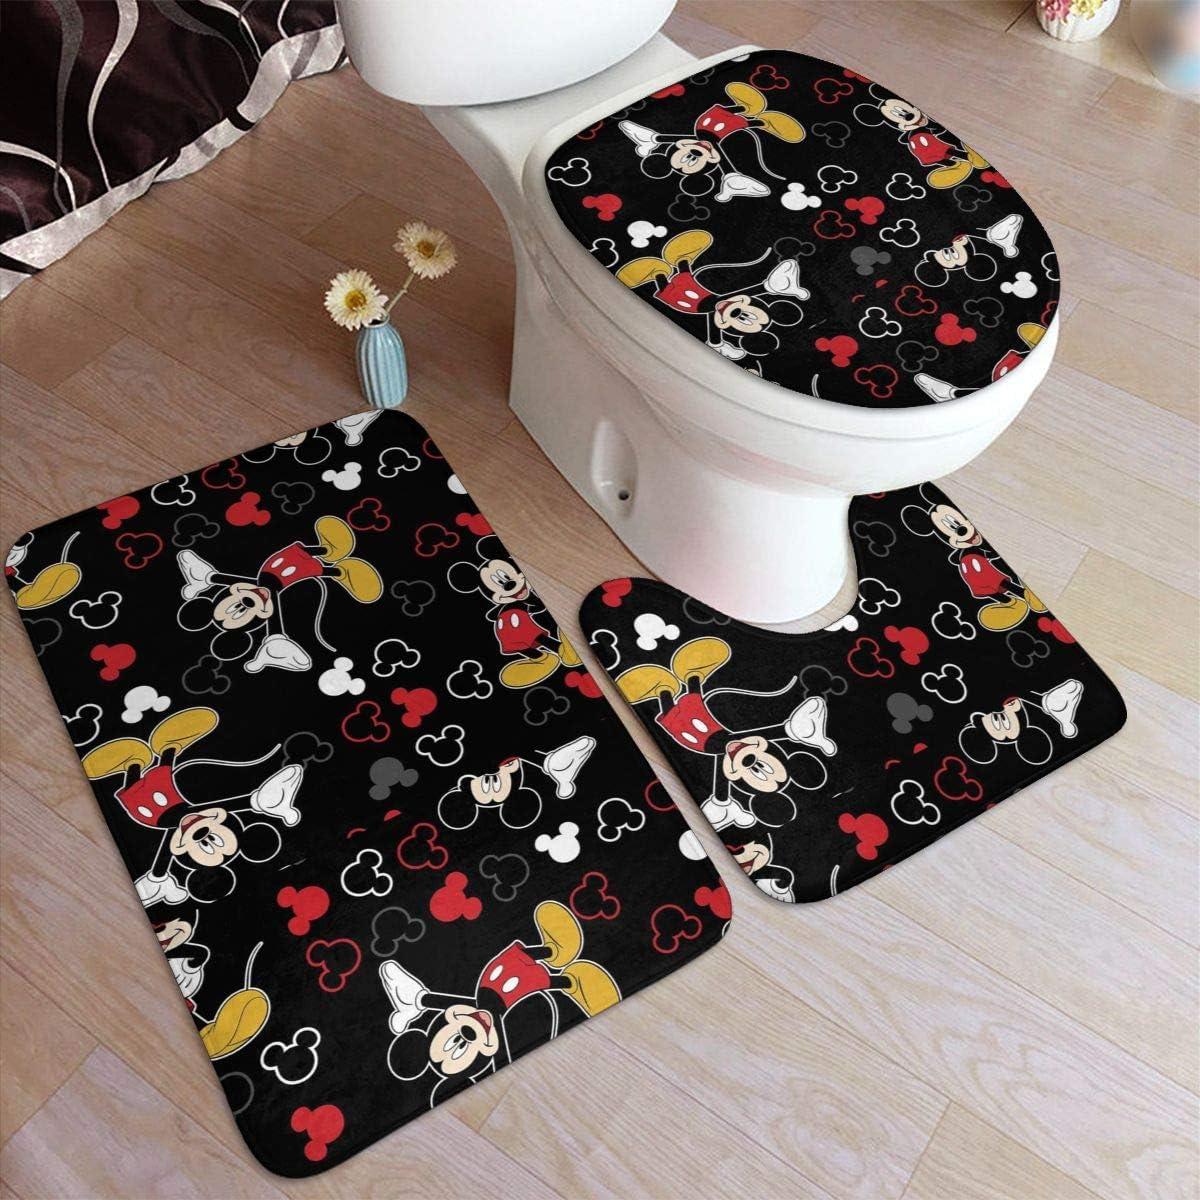 Amazon Com 3 Pack Bath Mat Set Mickey Mouse Black Non Slip Bathroom Rug Set U Shaped Contour Mat And Lid Cover Kitchen Dining